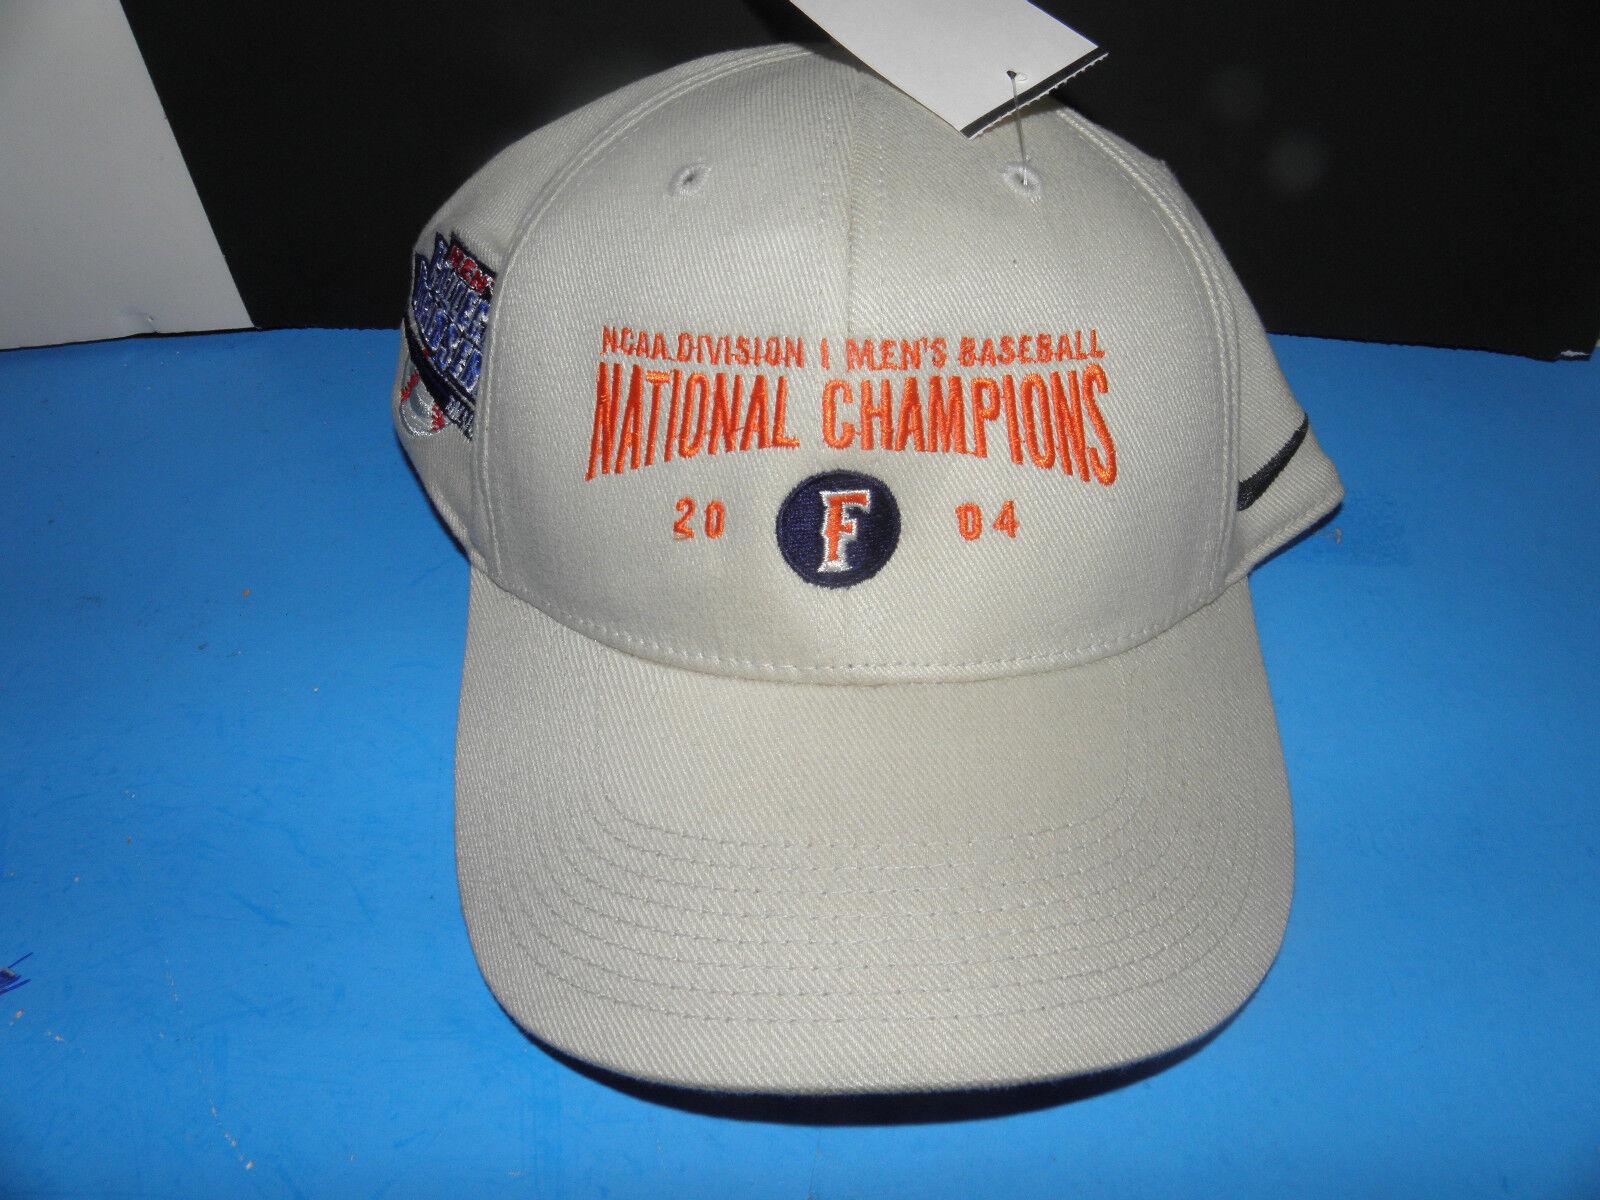 NCAA 2004 CAL STATE FULLERTON Natl. TITANS  Men's Baseball Natl. FULLERTON Champs Logo   Hat NWT 9f87d2